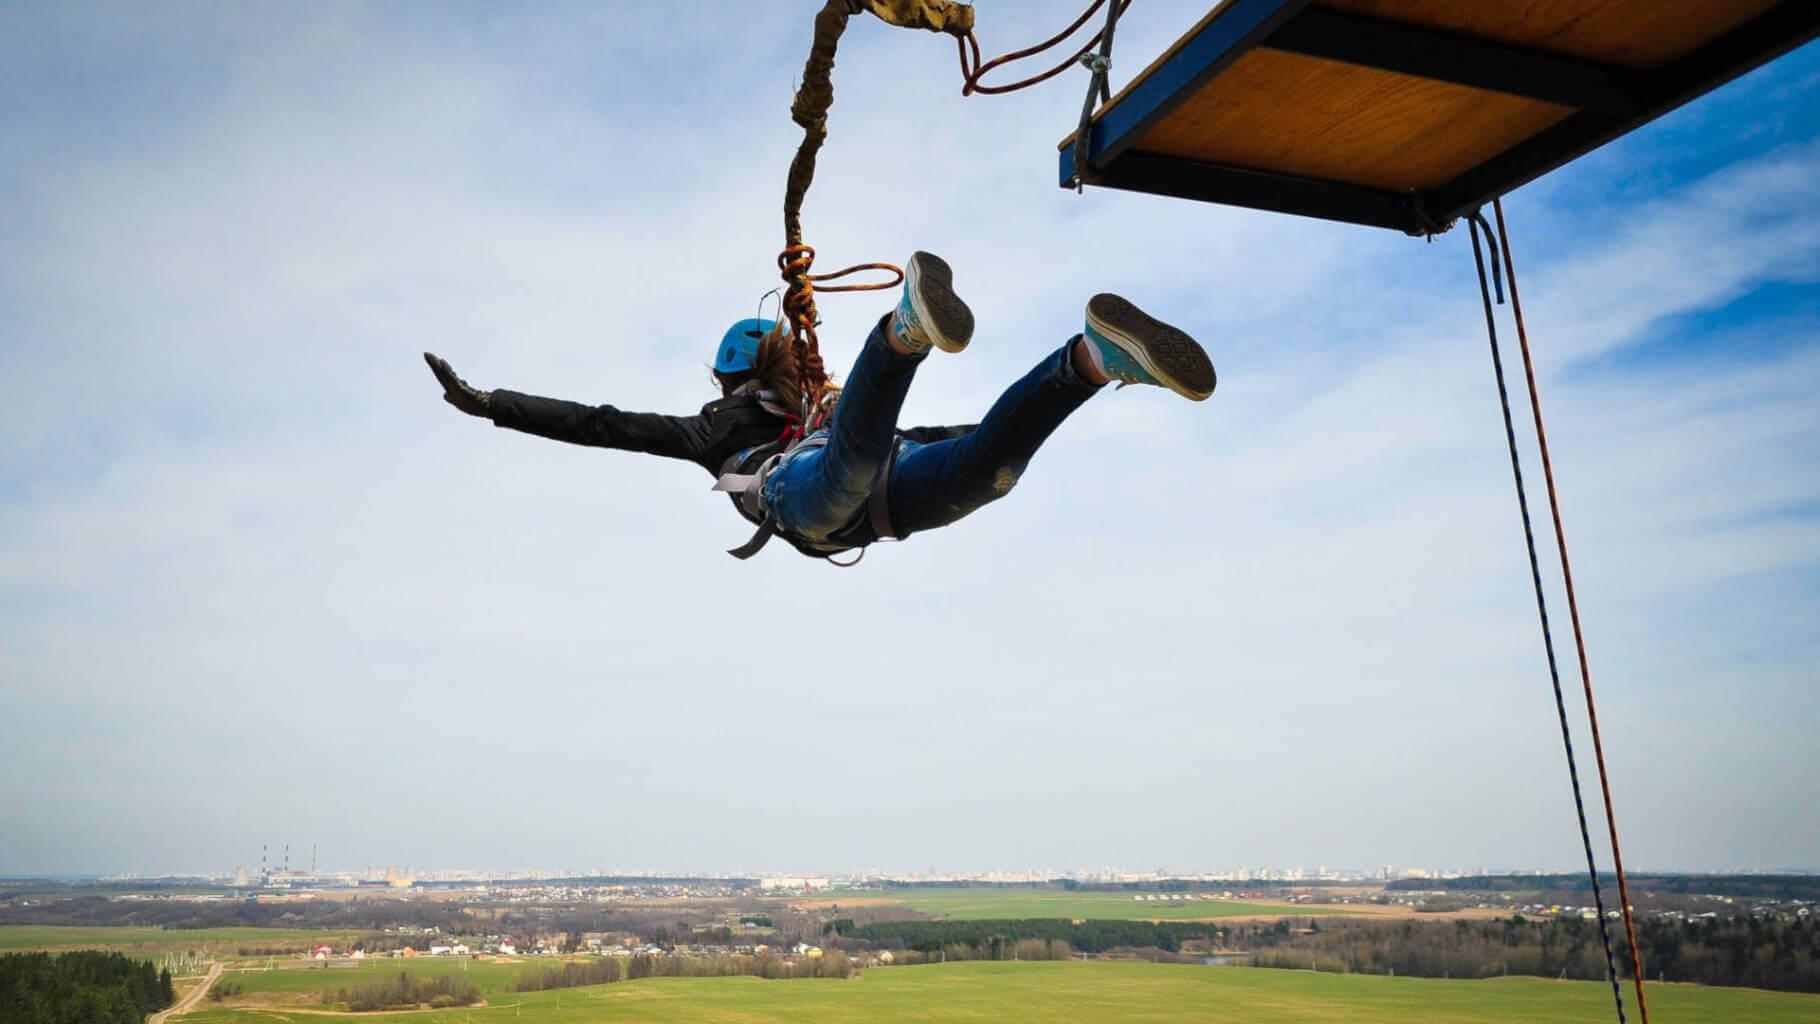 bungee jumping v ceske republice popularni adrenalinovy zazitek